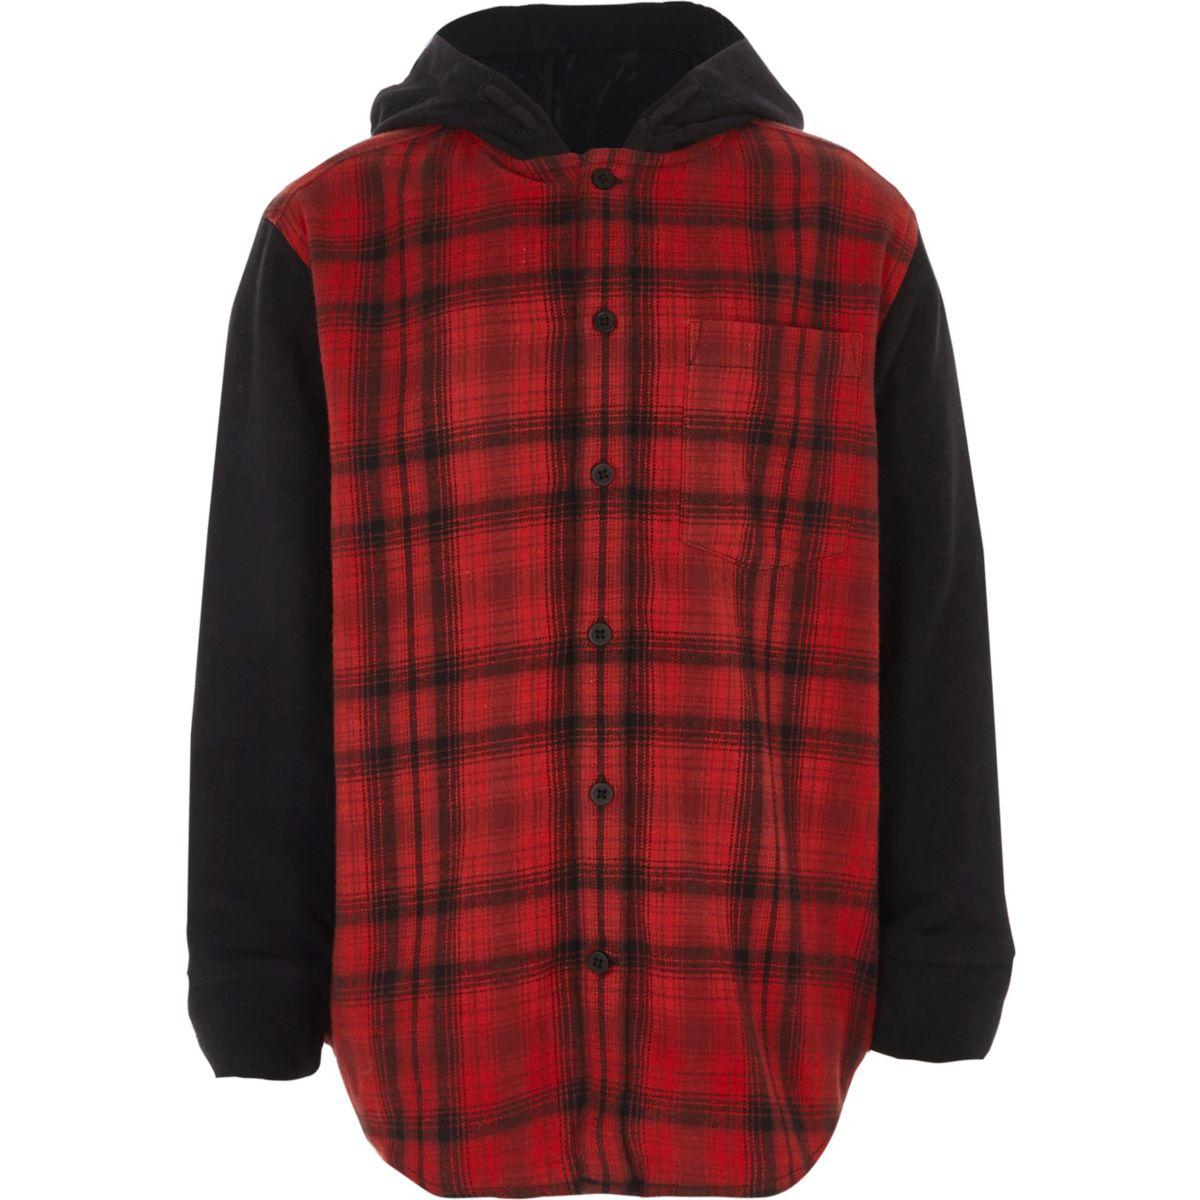 Boys red check hooded shirt